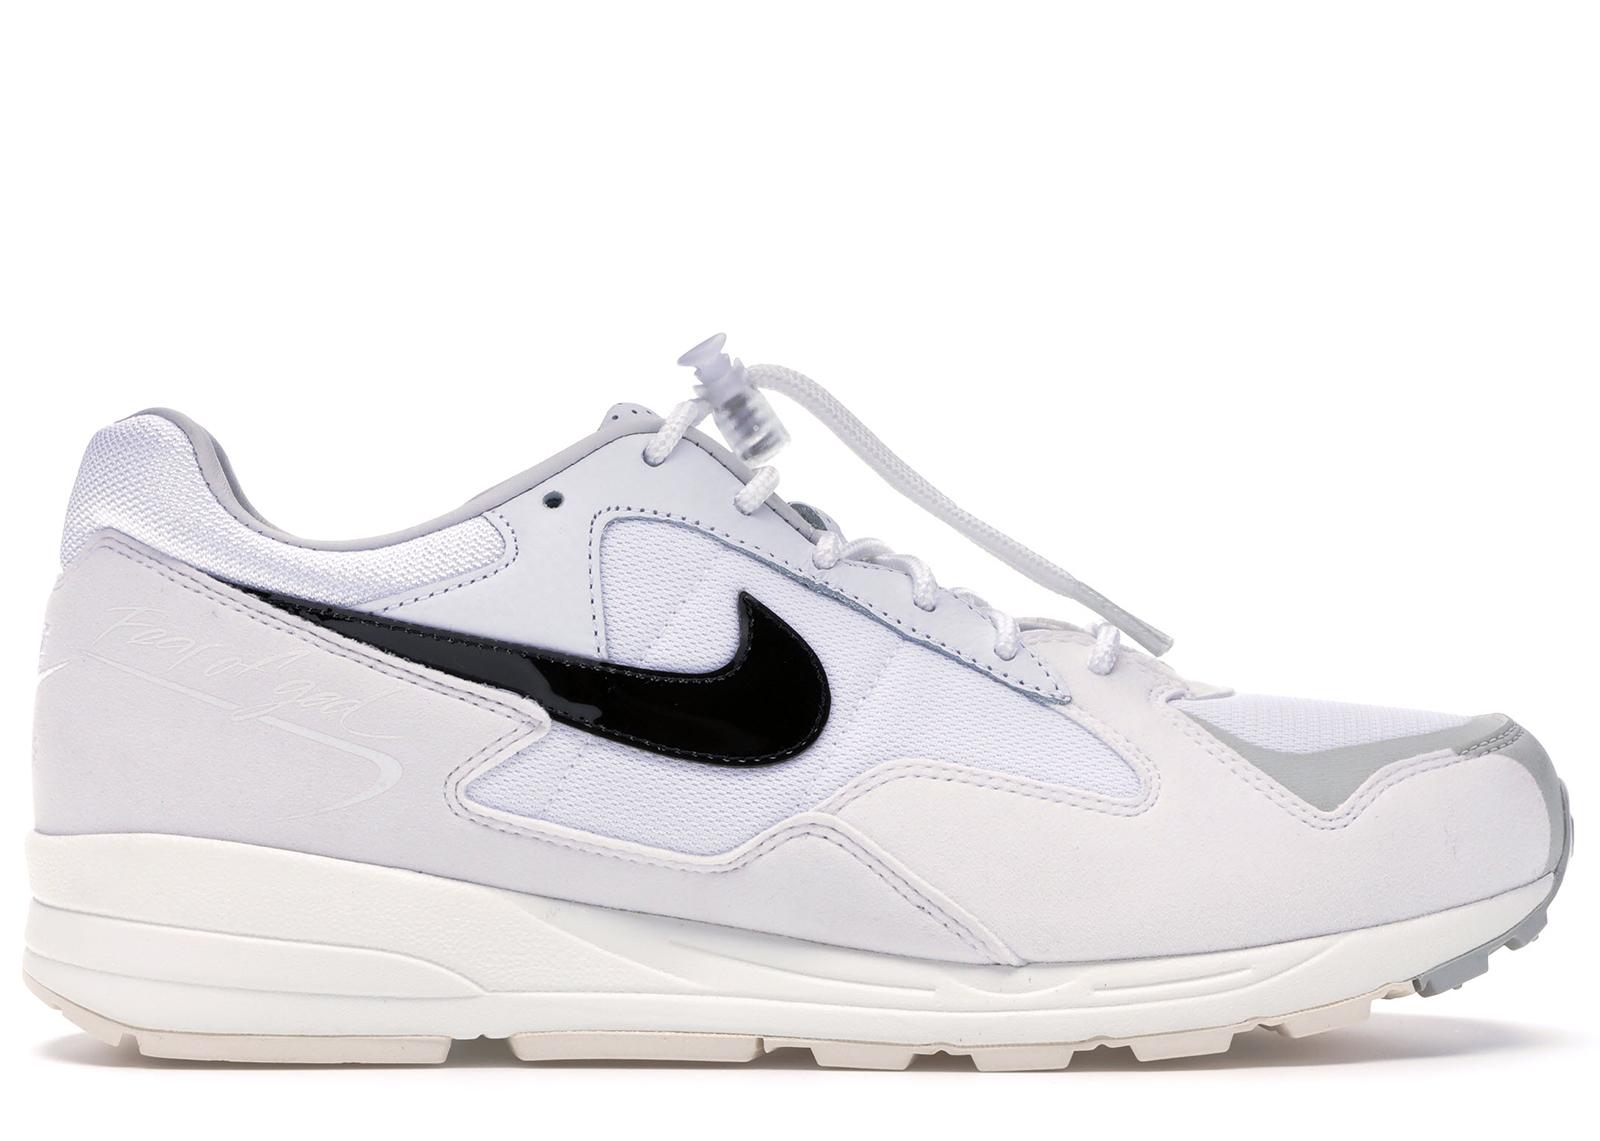 Nike Air Skylon 2 Fear of God White